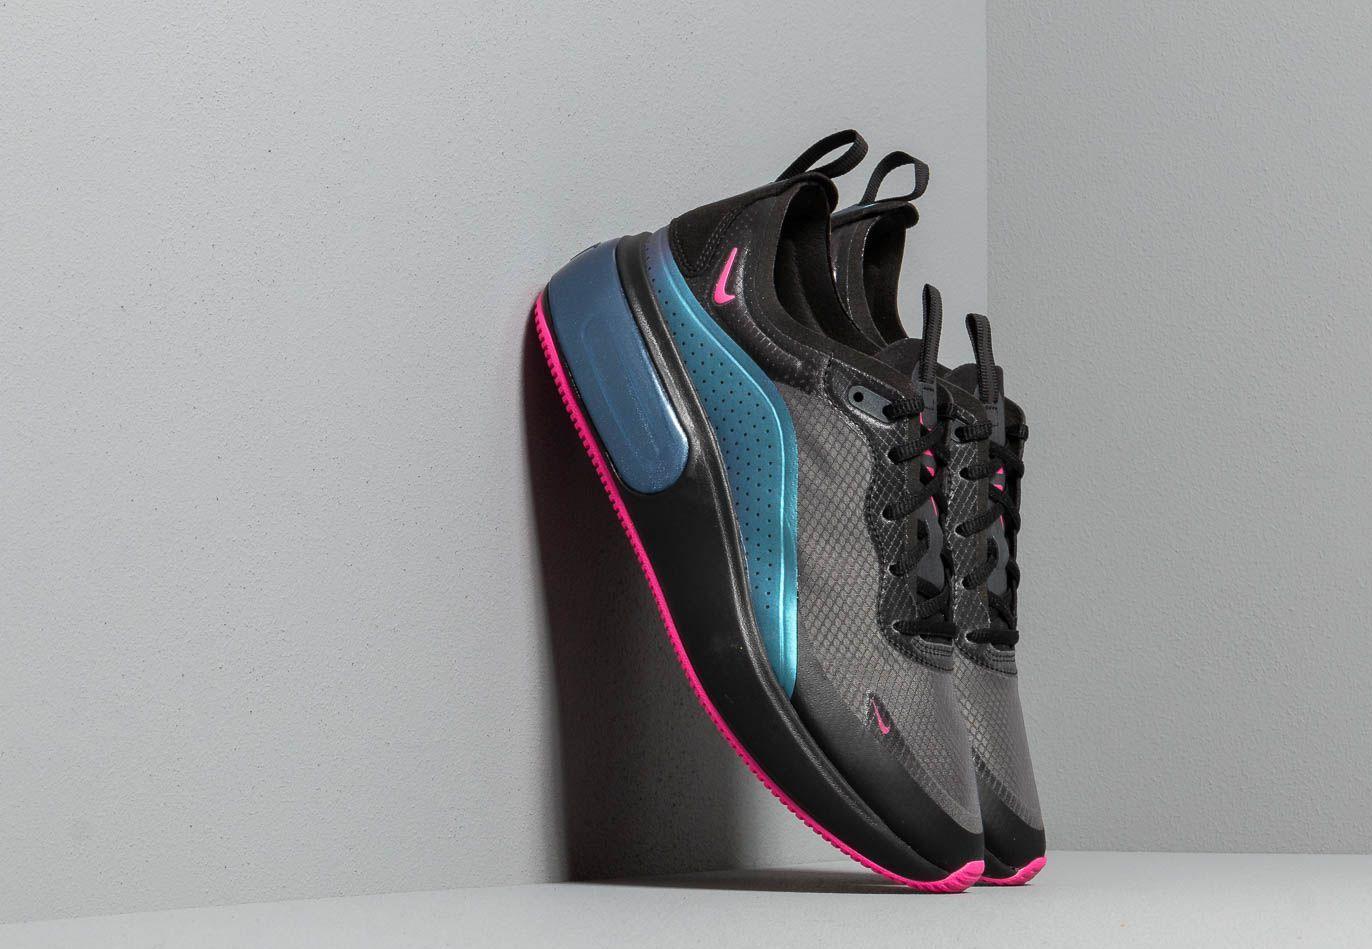 Nike W Air Max Dia Se Black/ Laser Fuchsia-Laser Fuchsia-Black